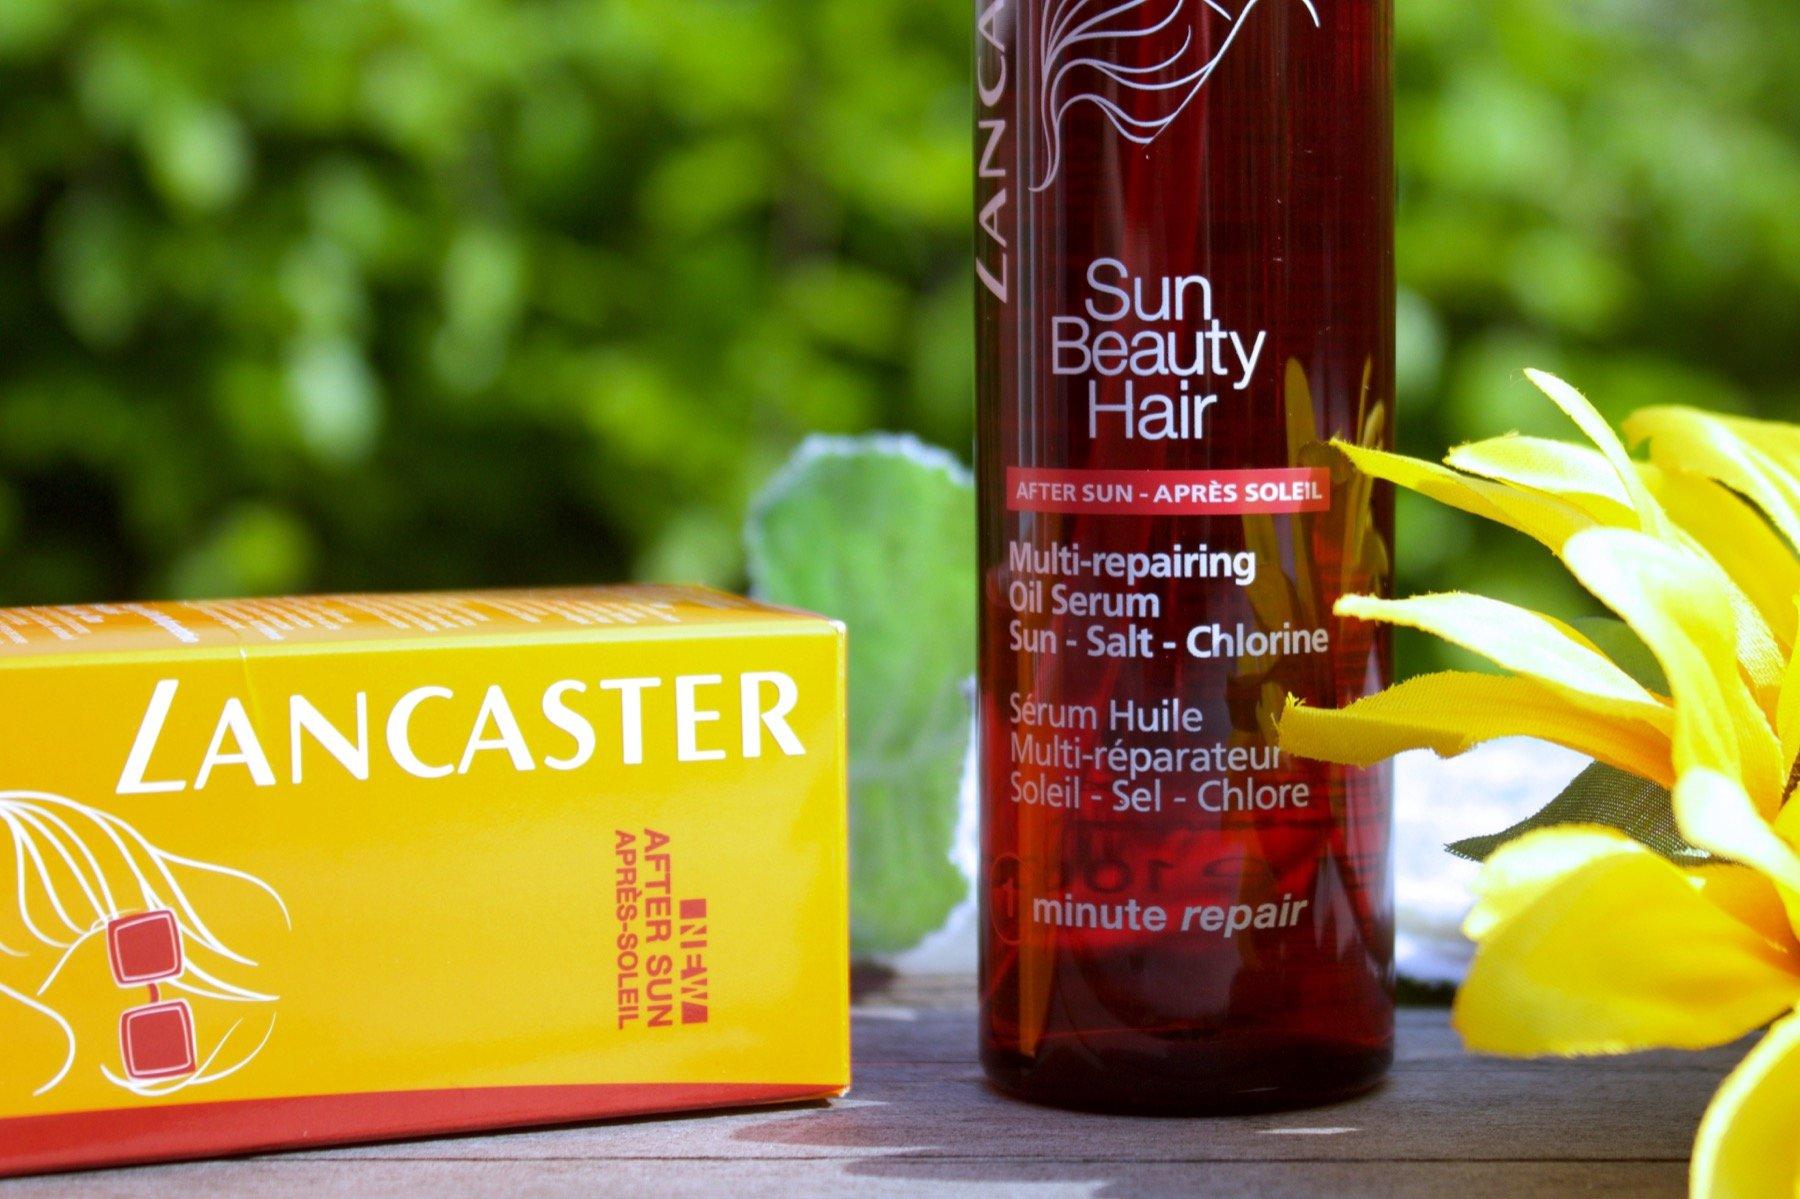 jenna minnie jennaminnie fashion blog lancaster sun beauty hair